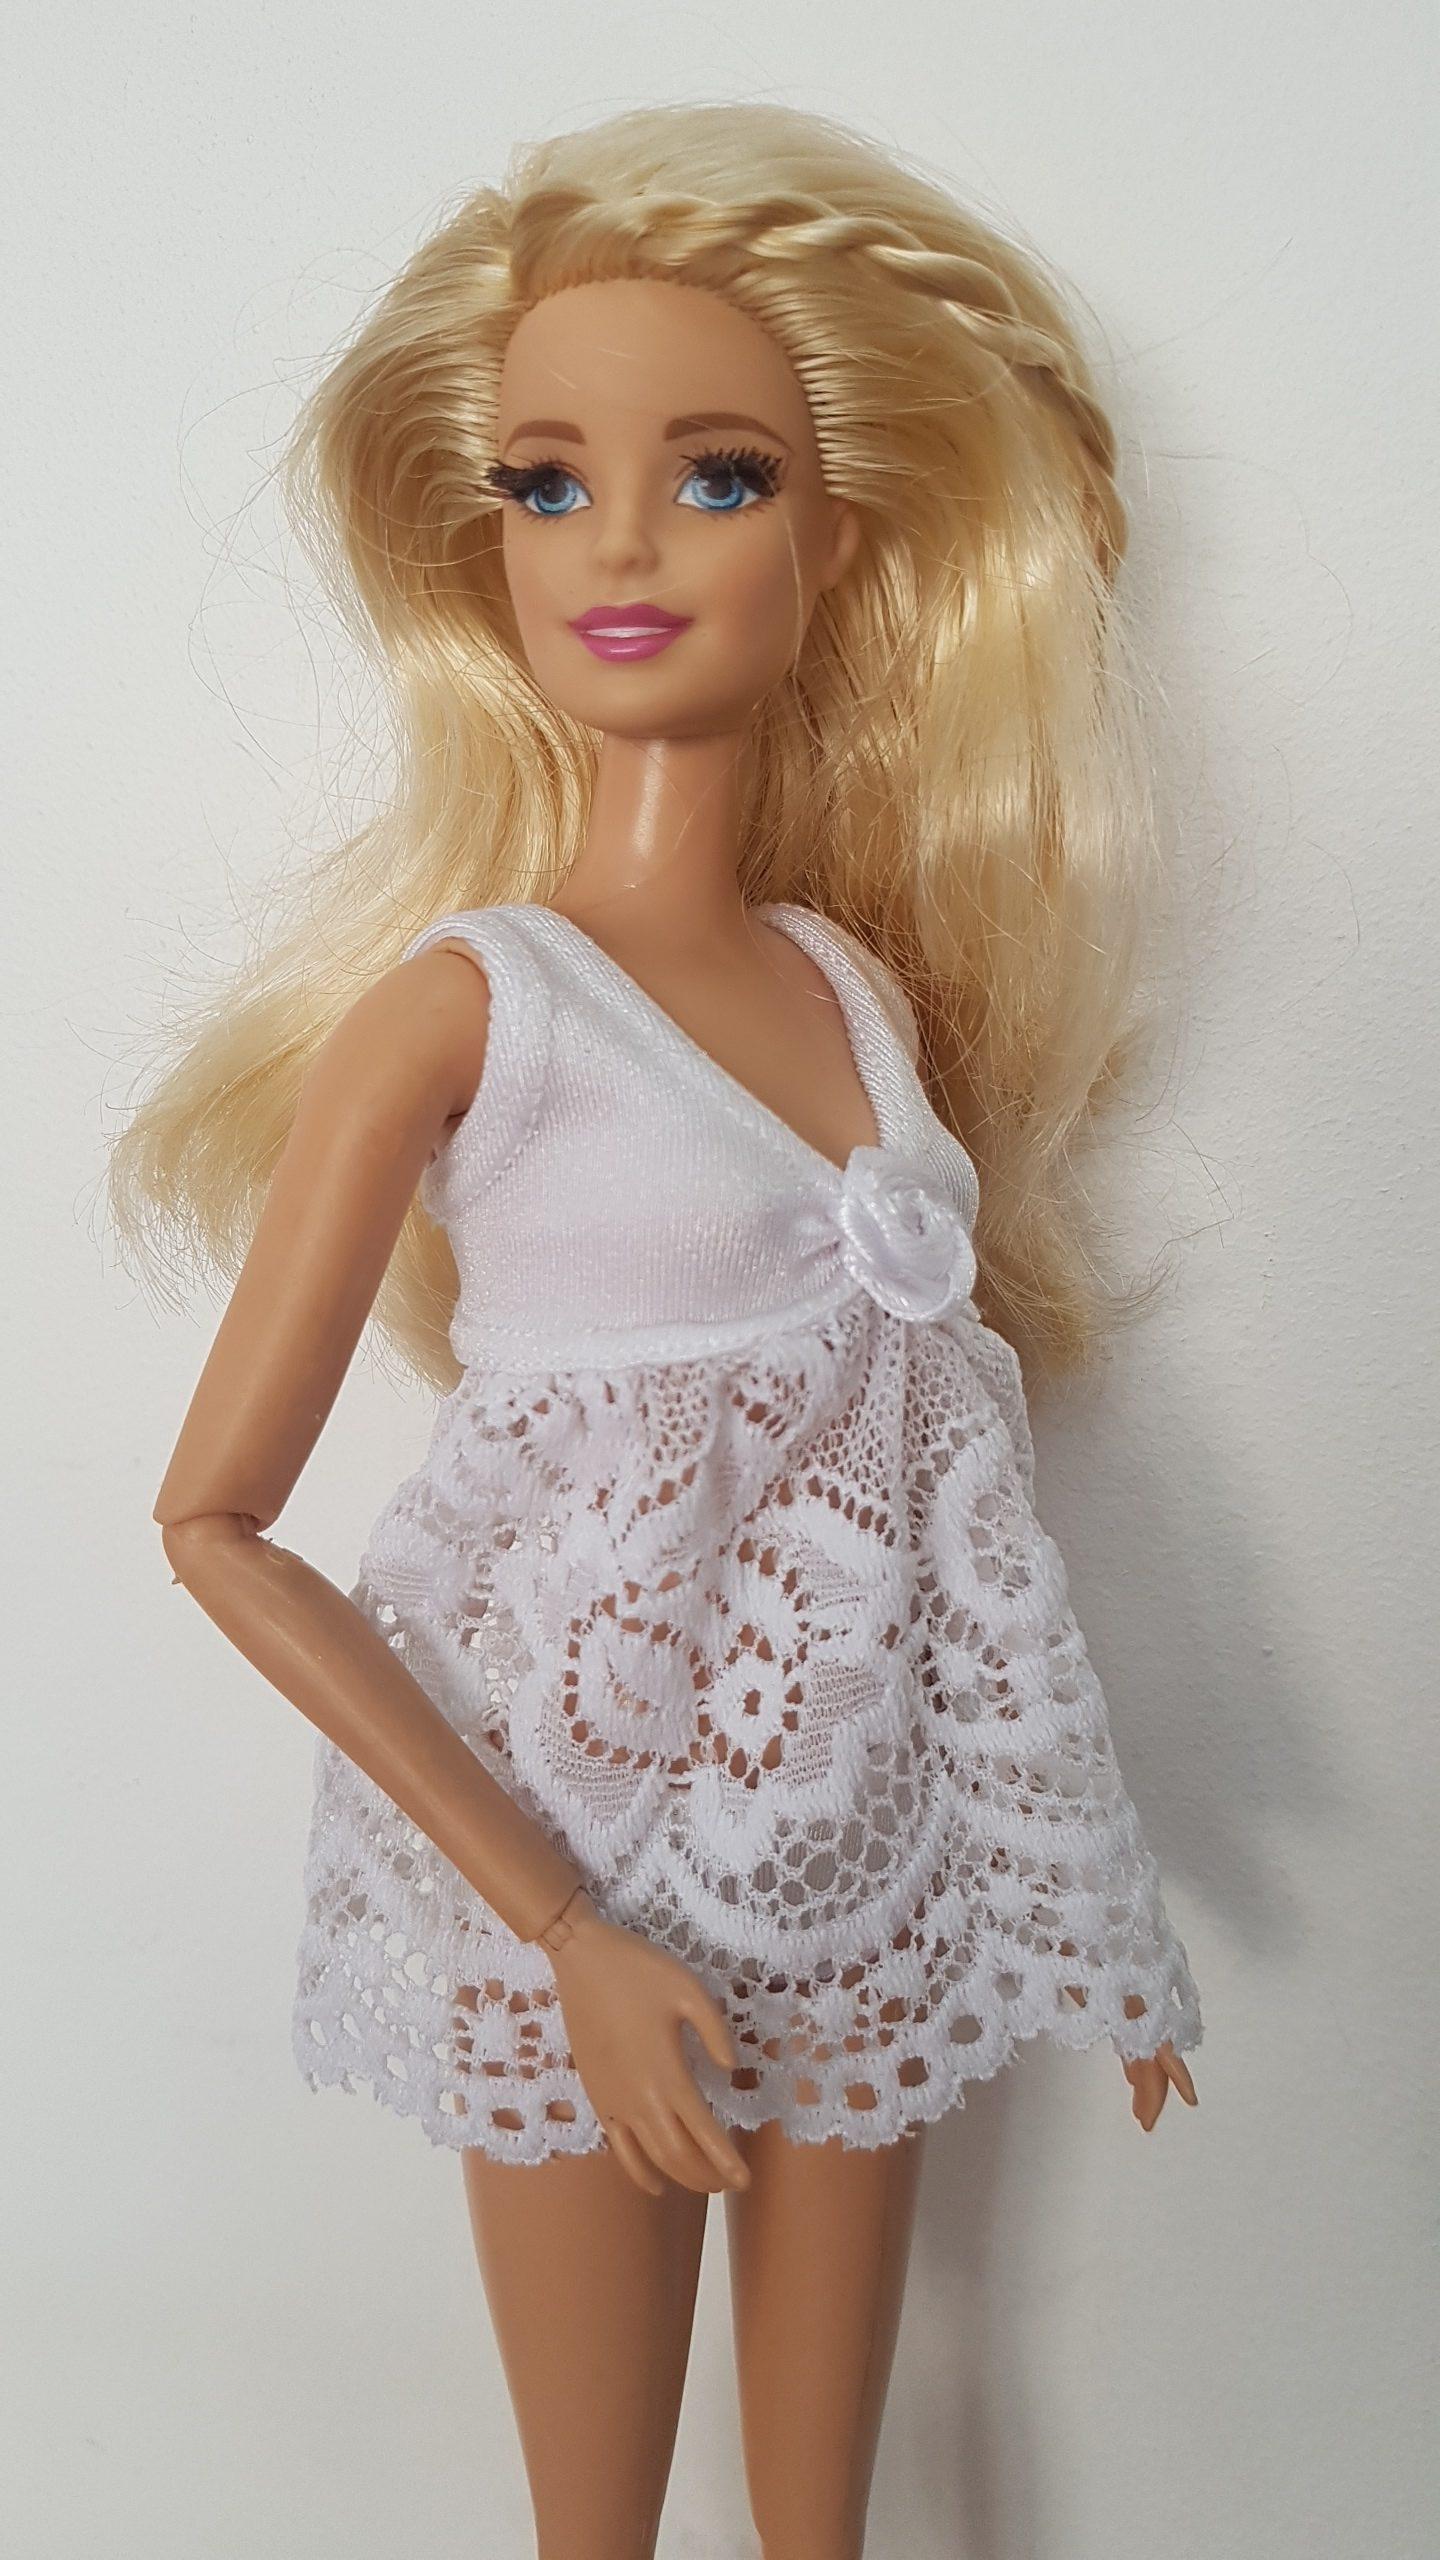 Sleepwear For Barbie Dolls